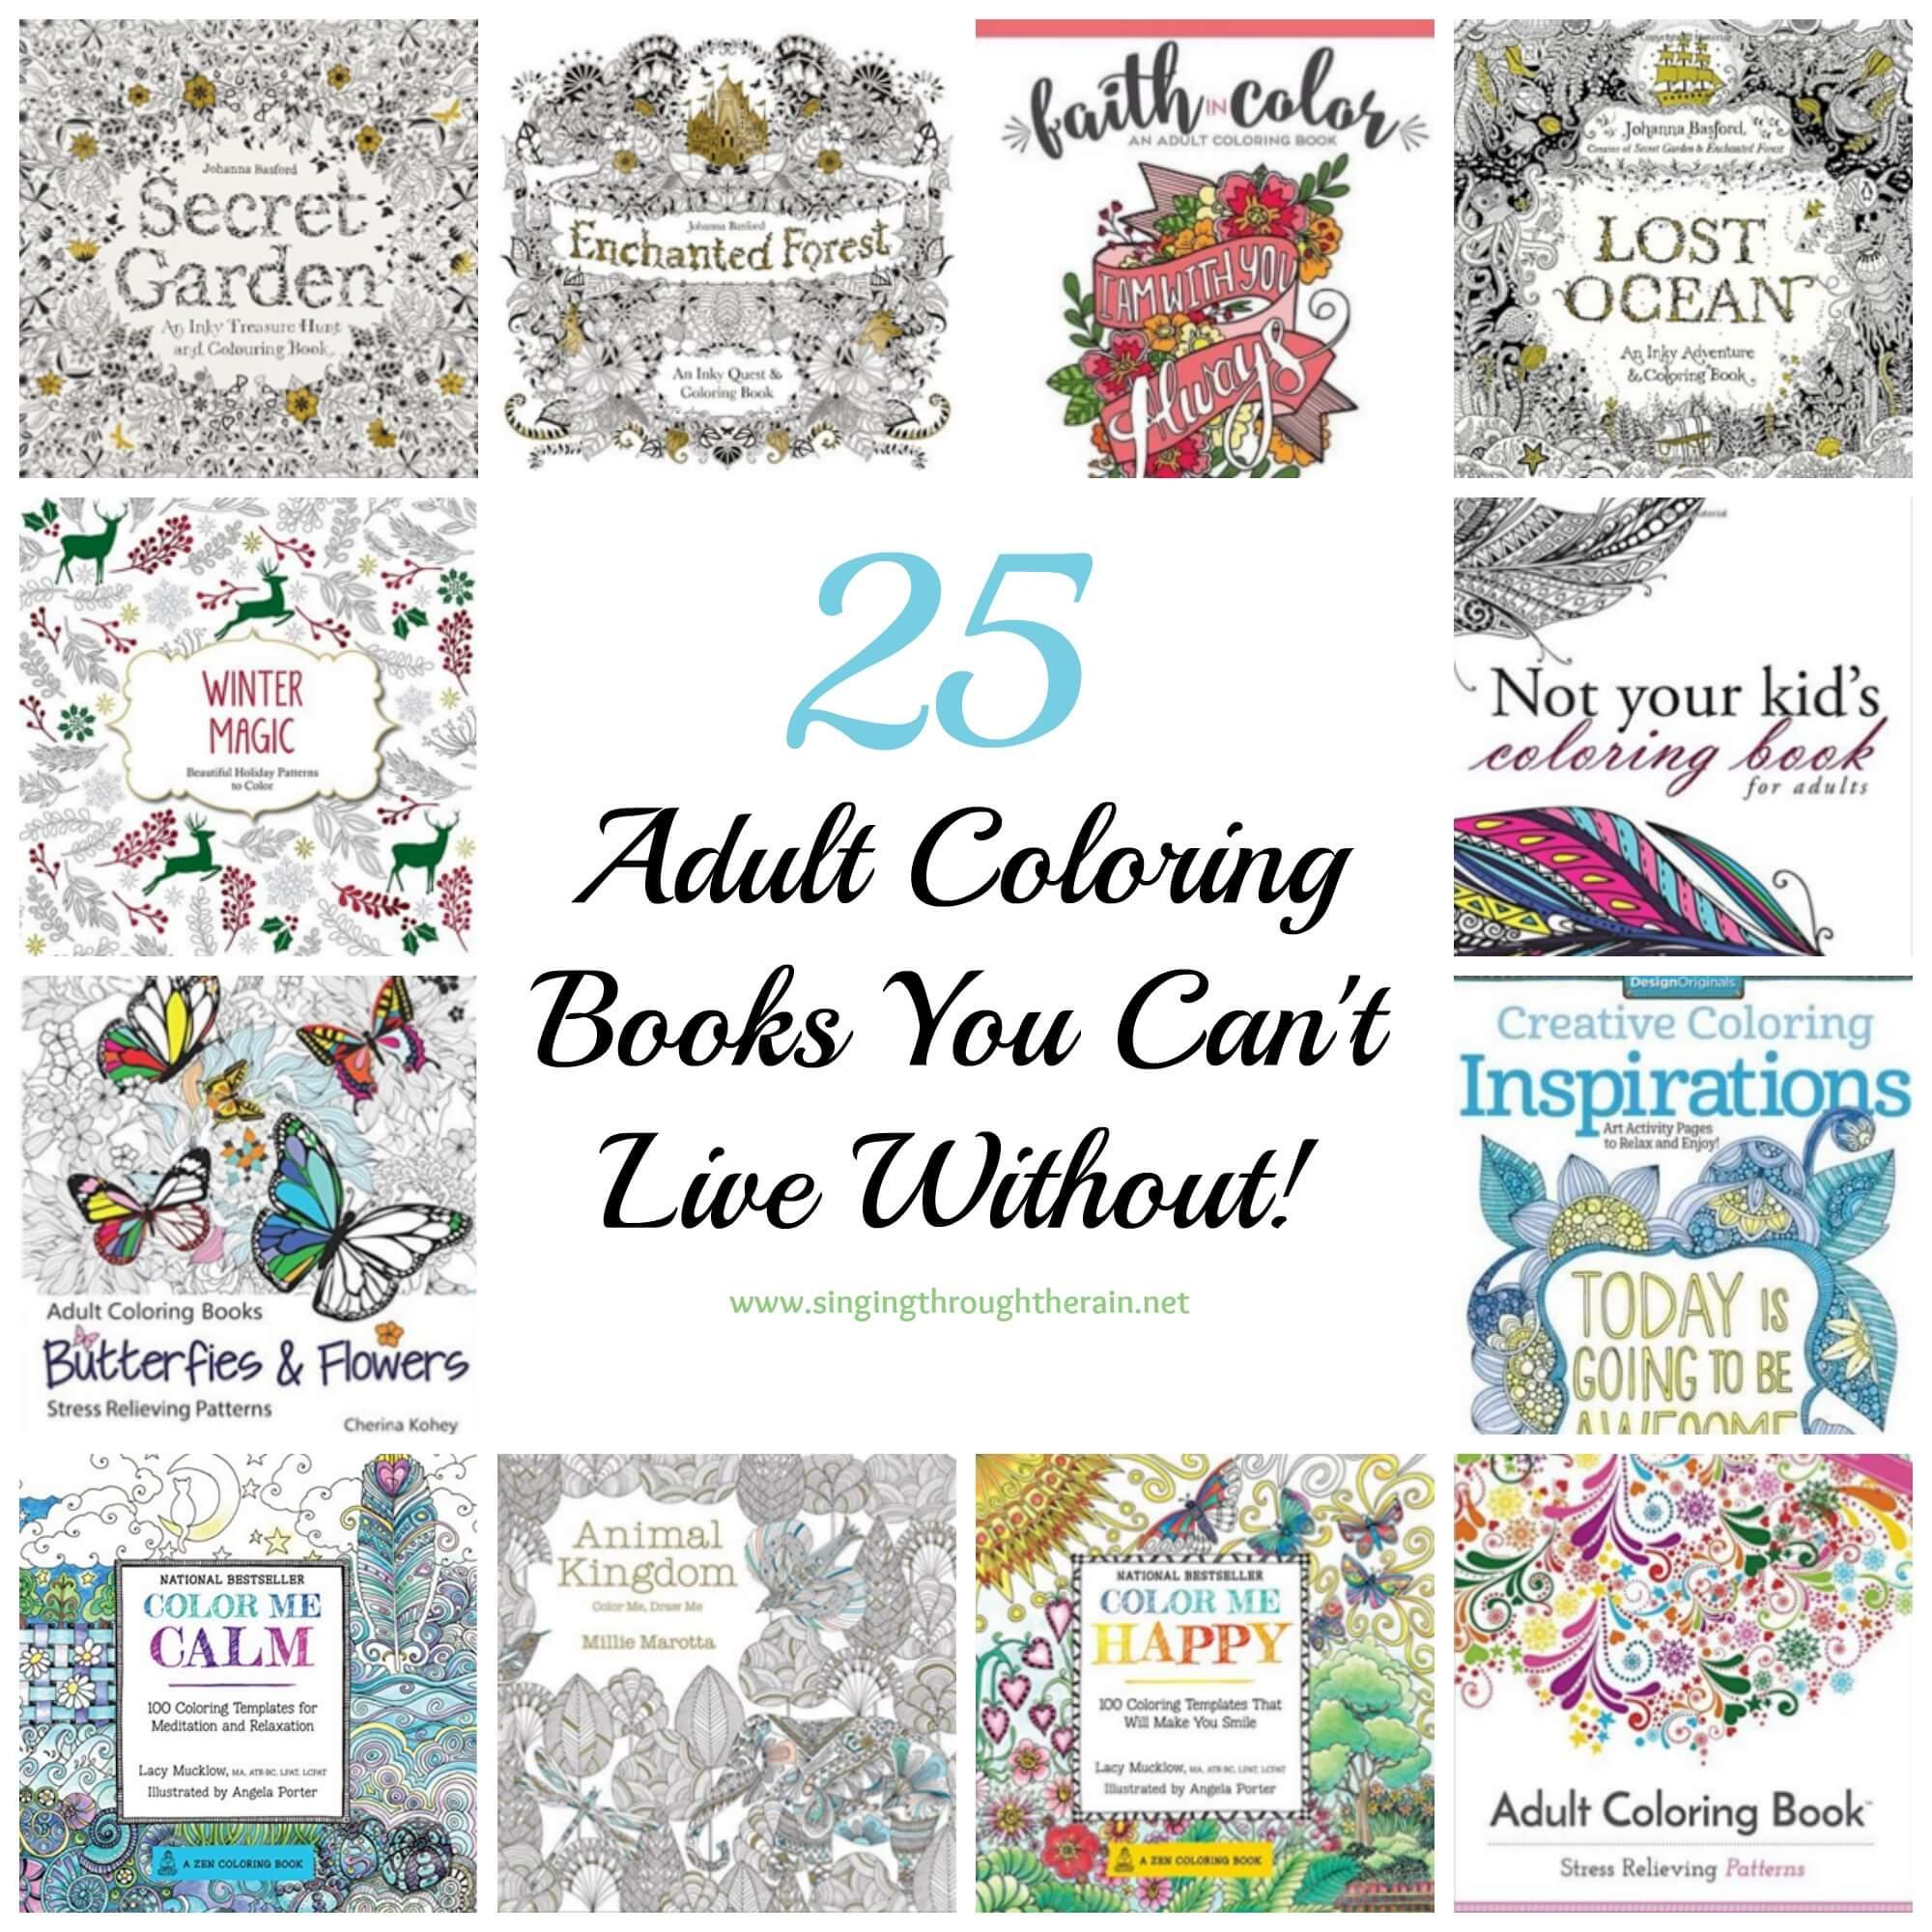 The secret garden coloring book barnes and noble - 25 Incredible Adult Coloring Books Secret Garden